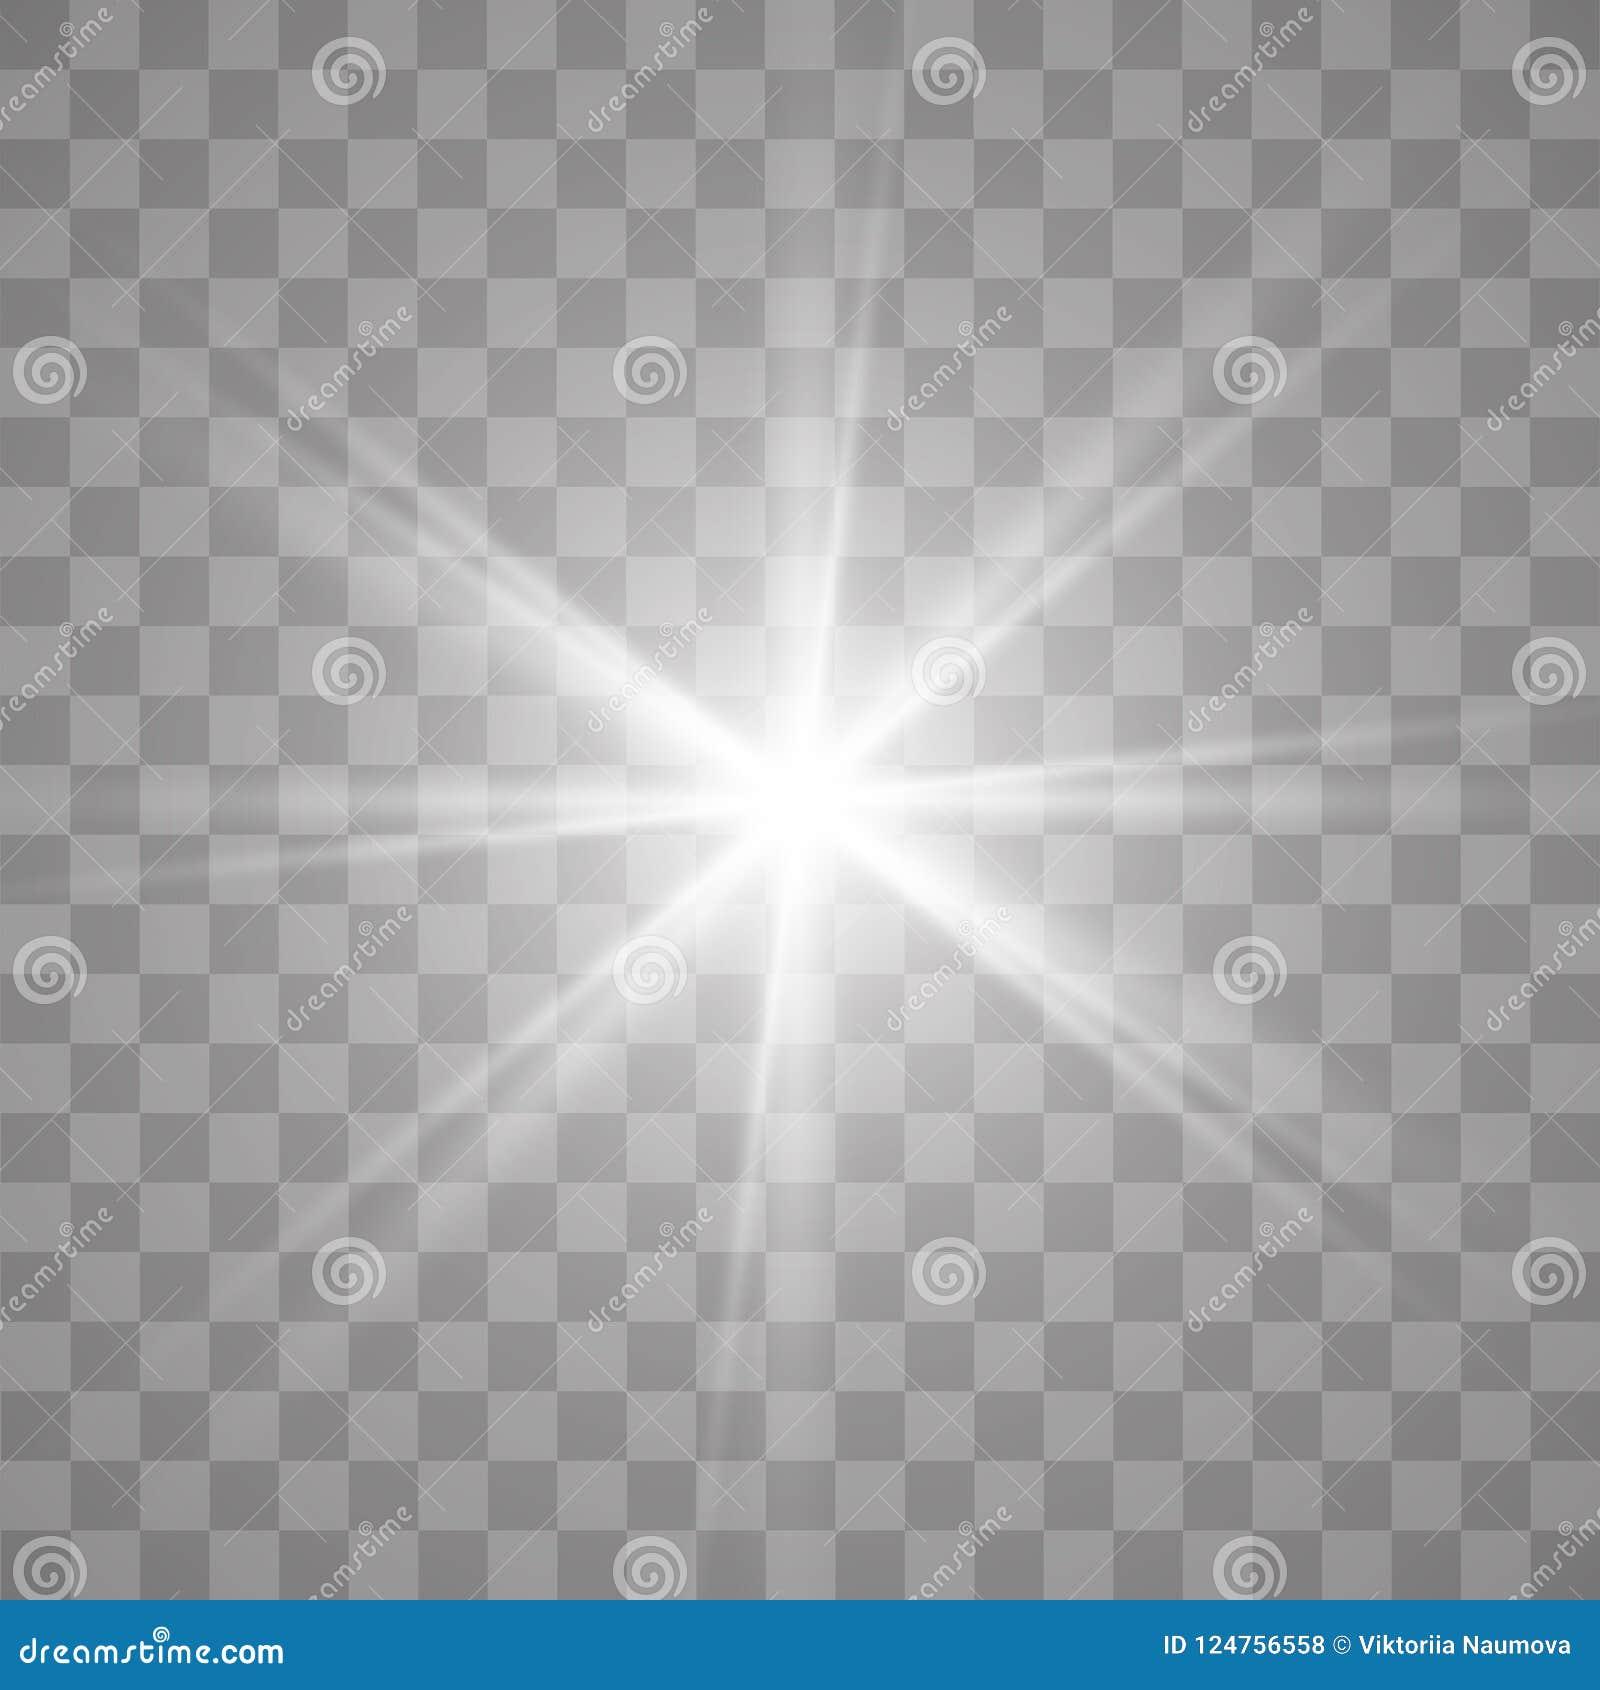 Light flare special effect. Illustration. Vector sparkles on transparent background.Light flare special effect.